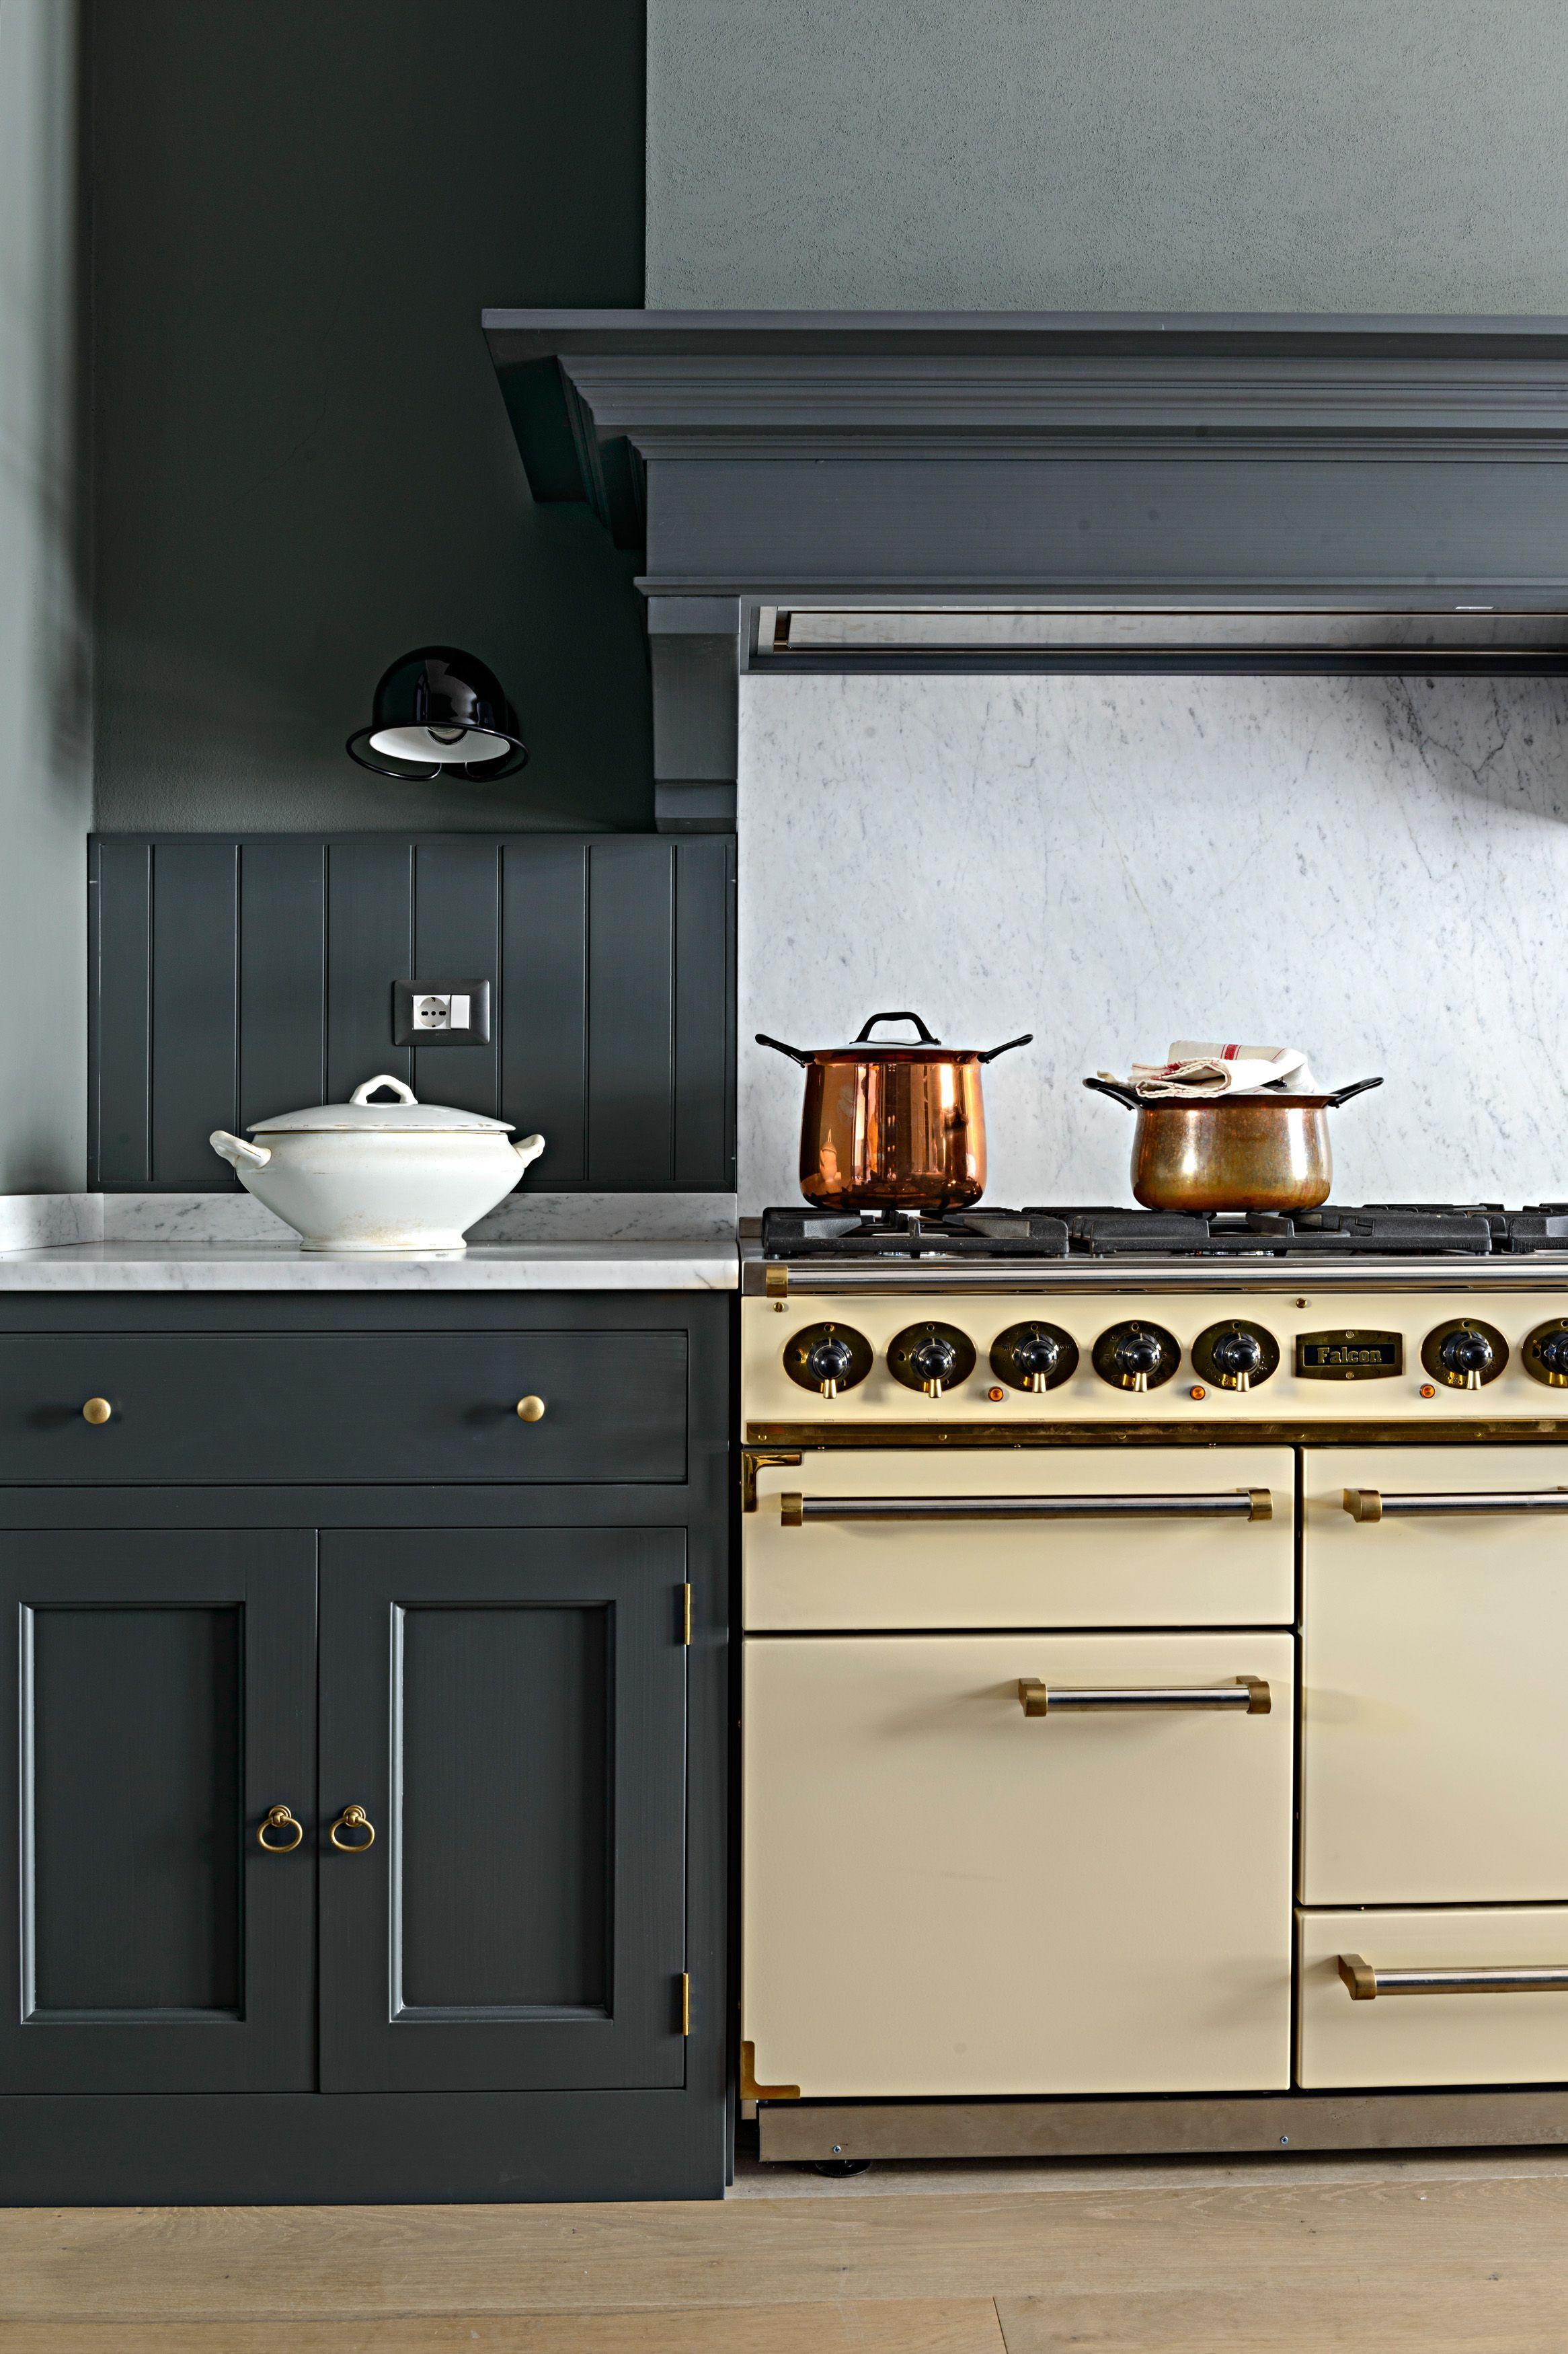 Cucina in stile country inglese monticello boiserie a doghe e splash back in marmo di carrara - Cucina in inglese ...